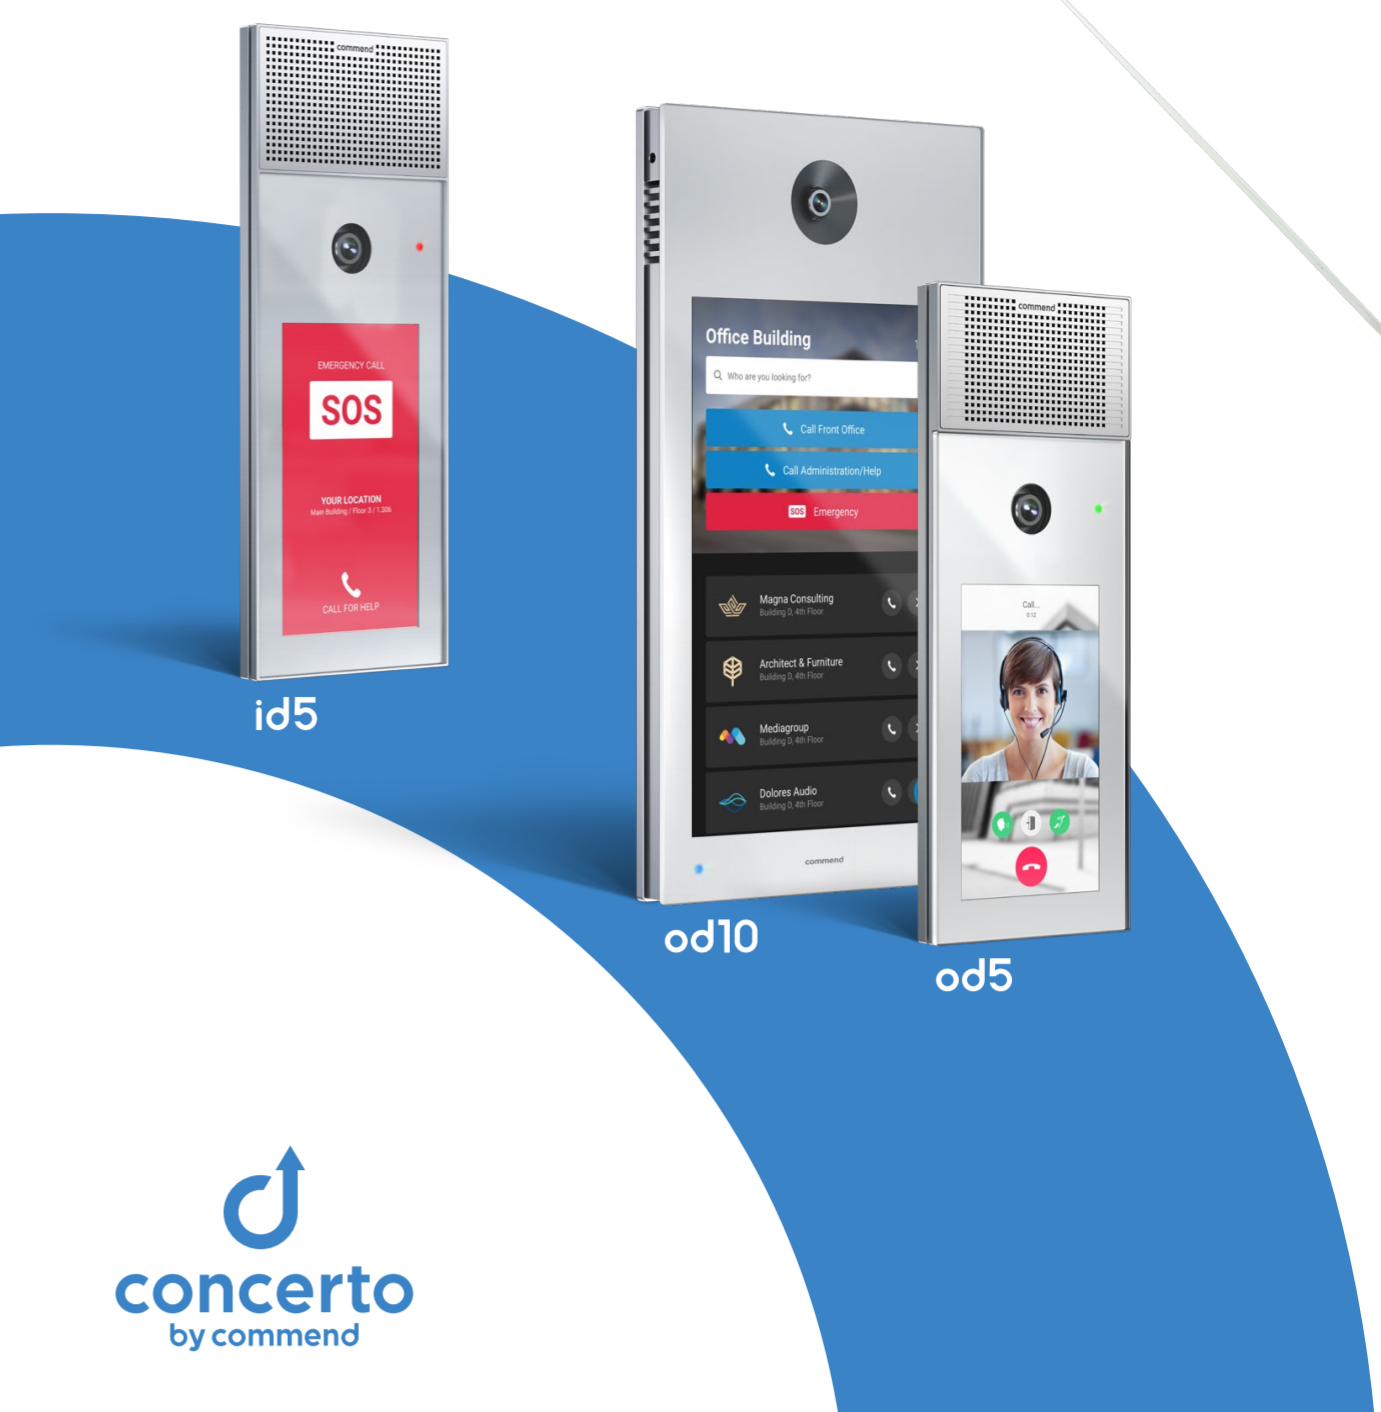 Concerto intercom image